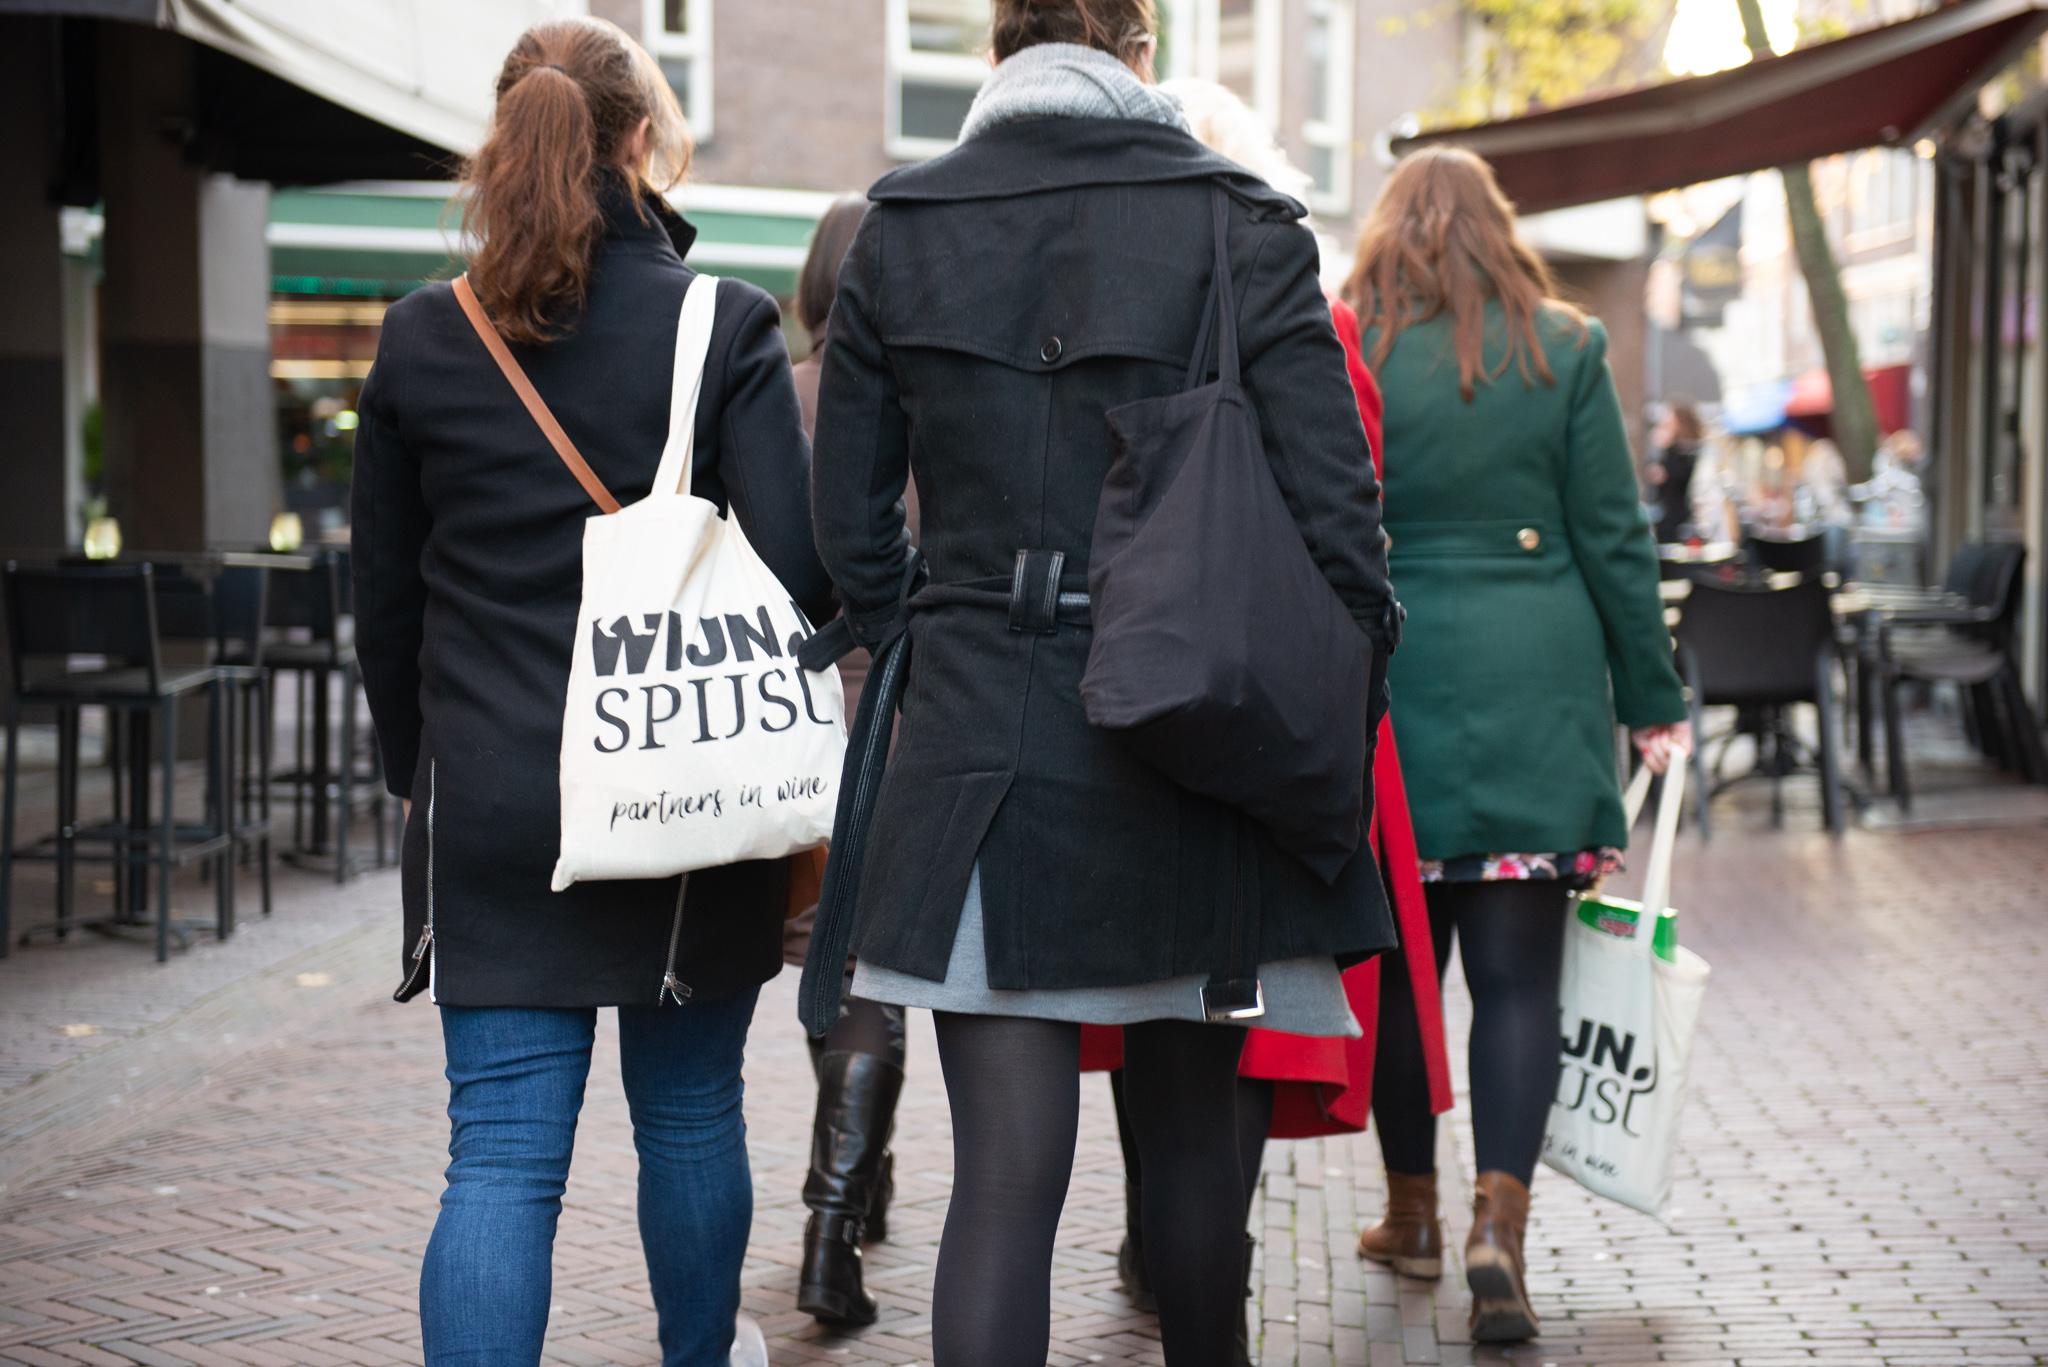 Rotterdam | Illegaal culinair wandelen nu toch toegestaan